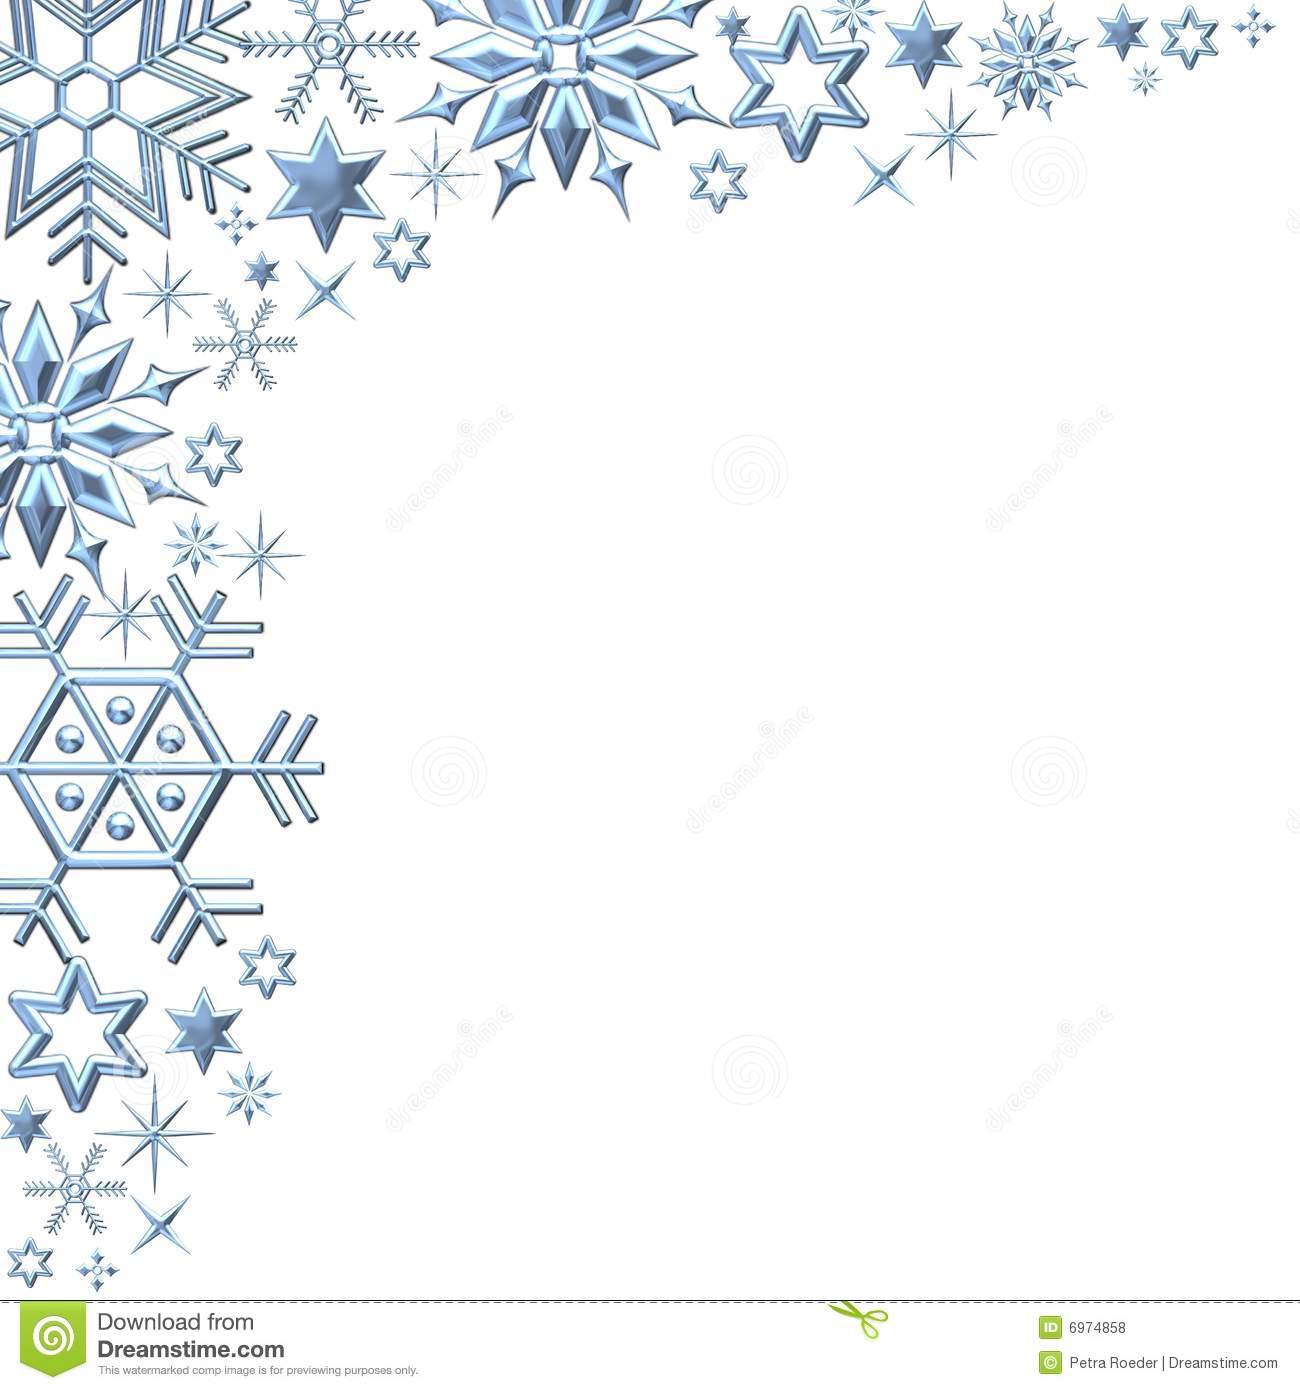 Winter Borders Free Clip Art & Winter Borders Clip Art Clip Art.